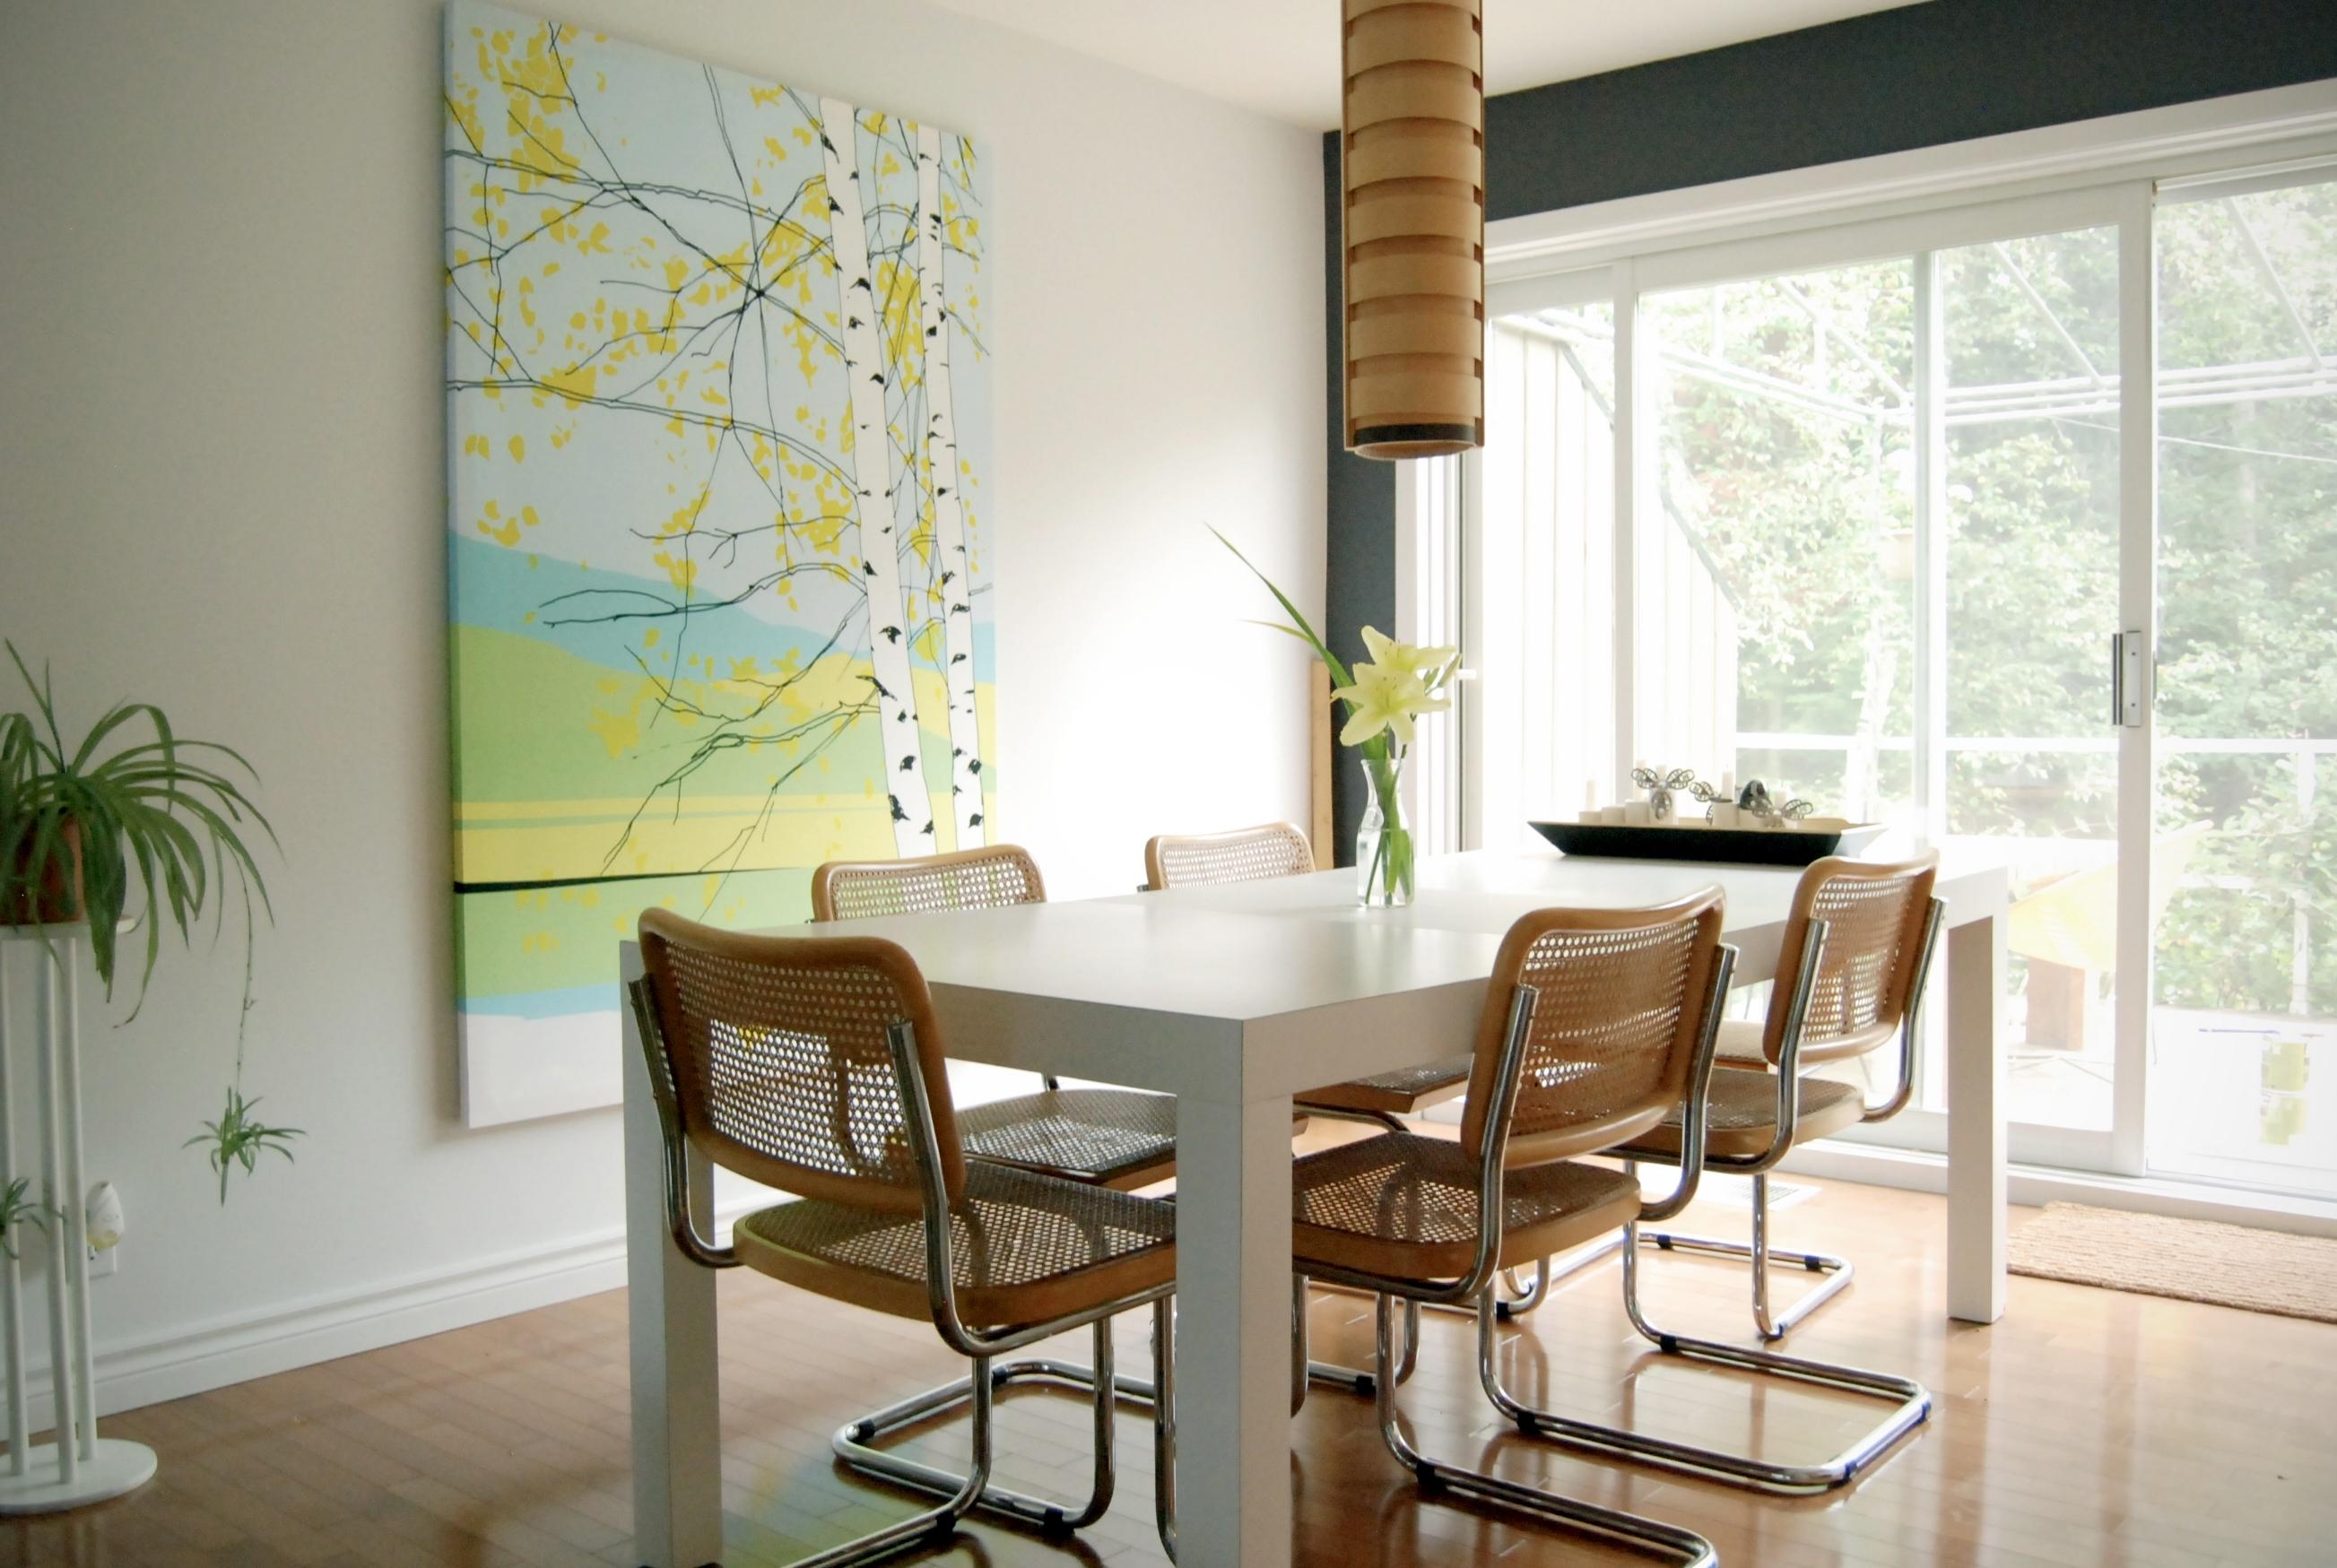 Kaiku Marimekko Fabric Stretched Over Canvas. Find The Fabric At with regard to 2017 Marimekko Fabric Wall Art